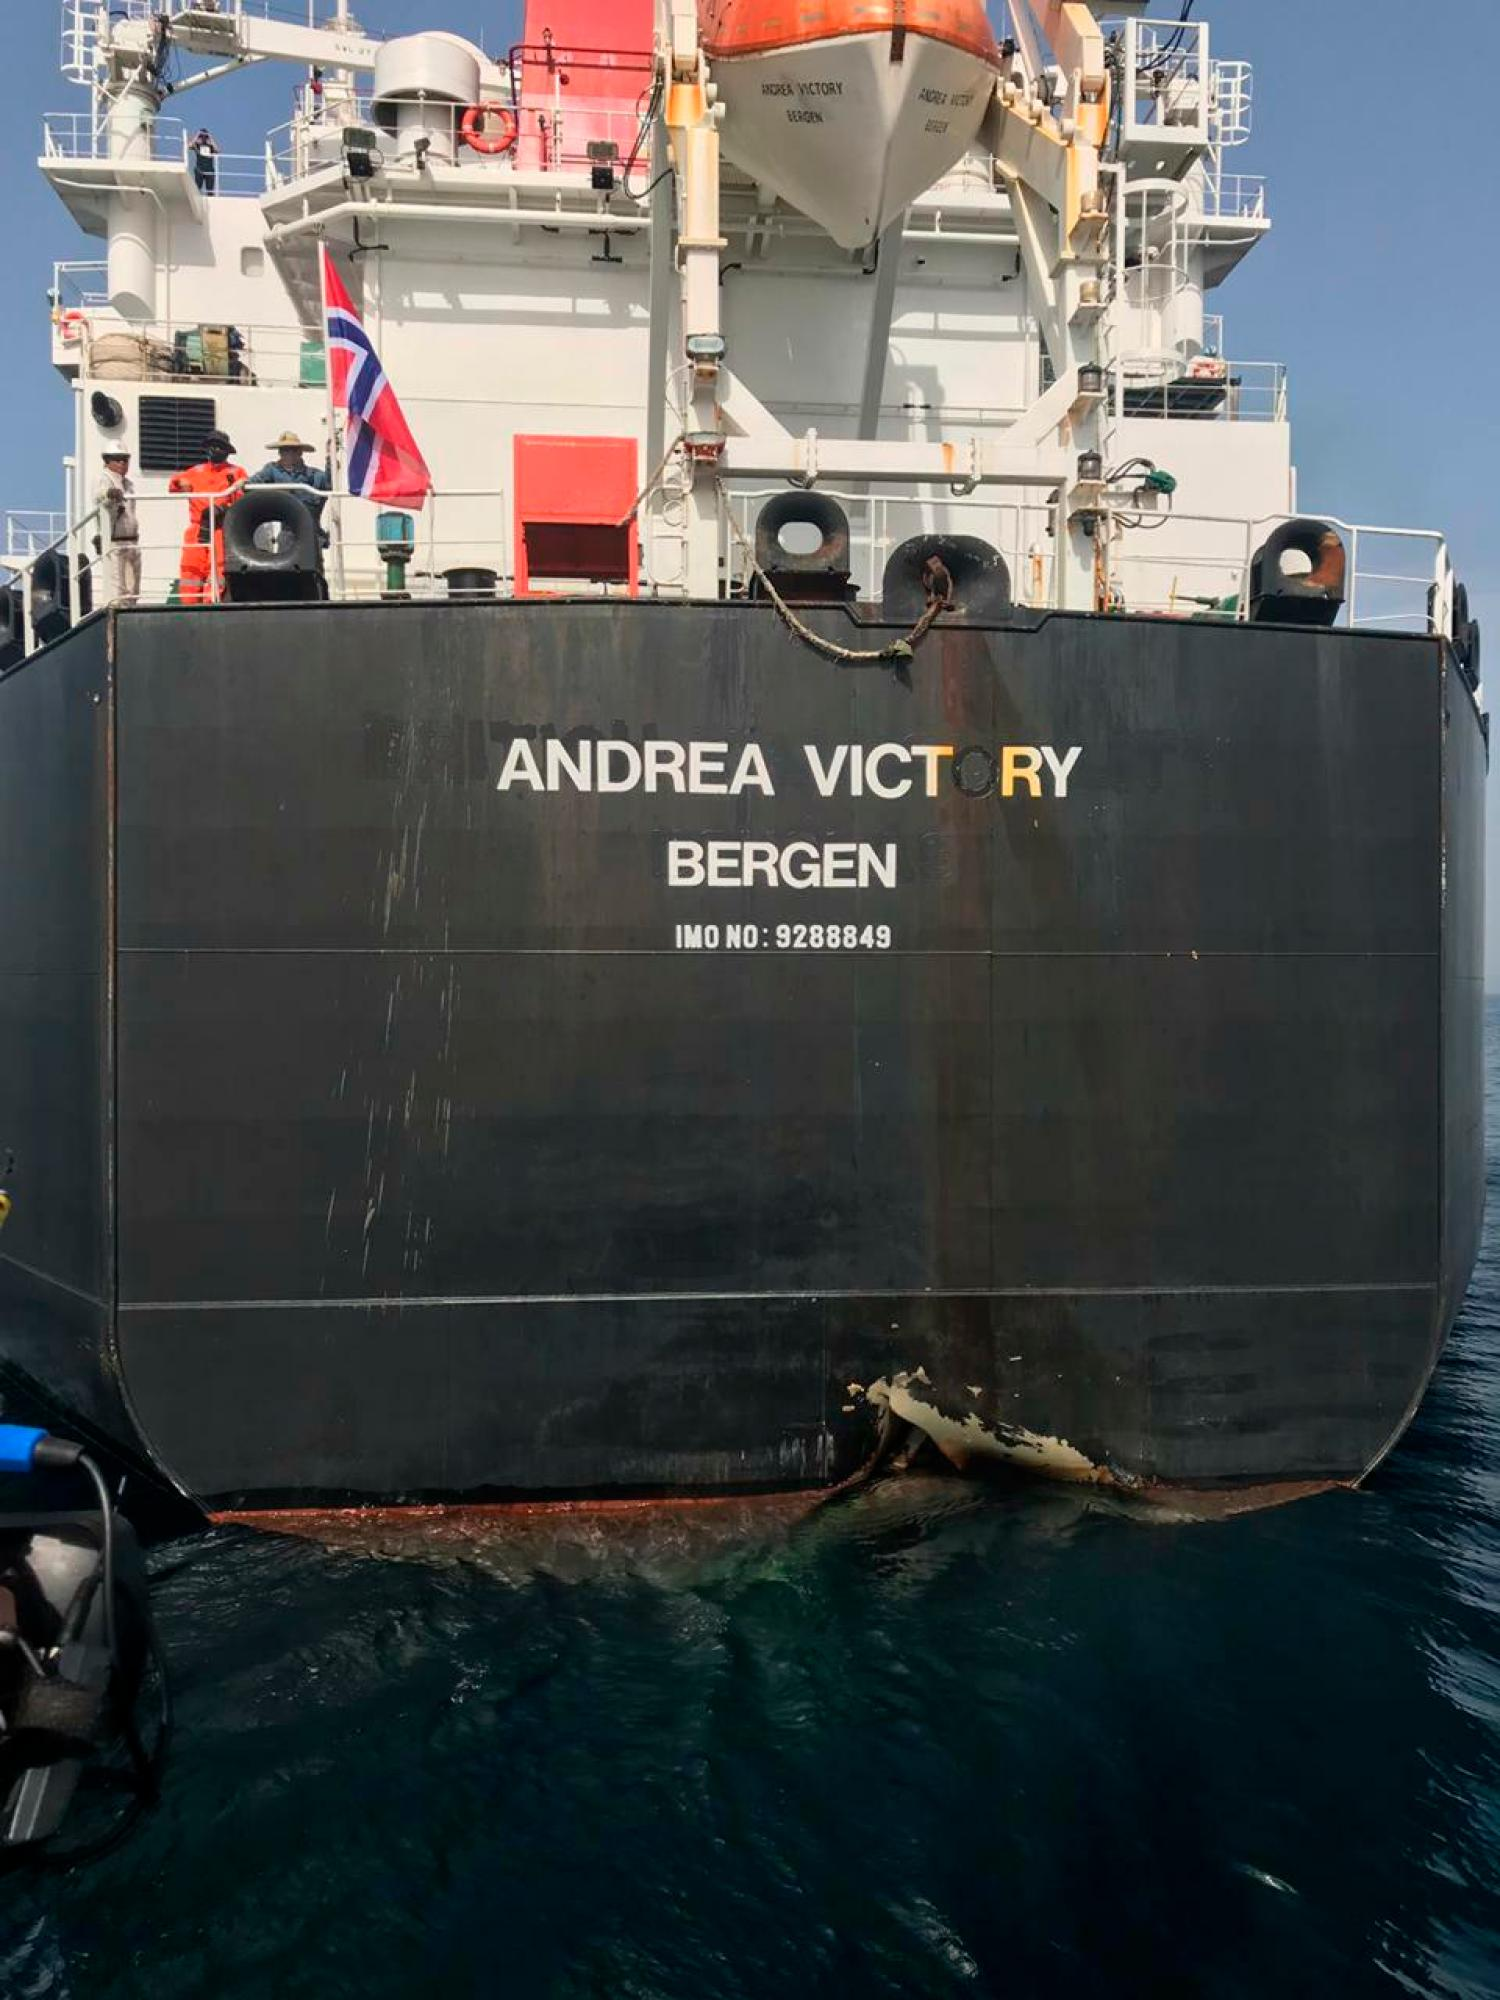 960x0 - After Tanker Sabotage, 'Armed Drones' Set Fire To Vital Saudi Oil Pipeline